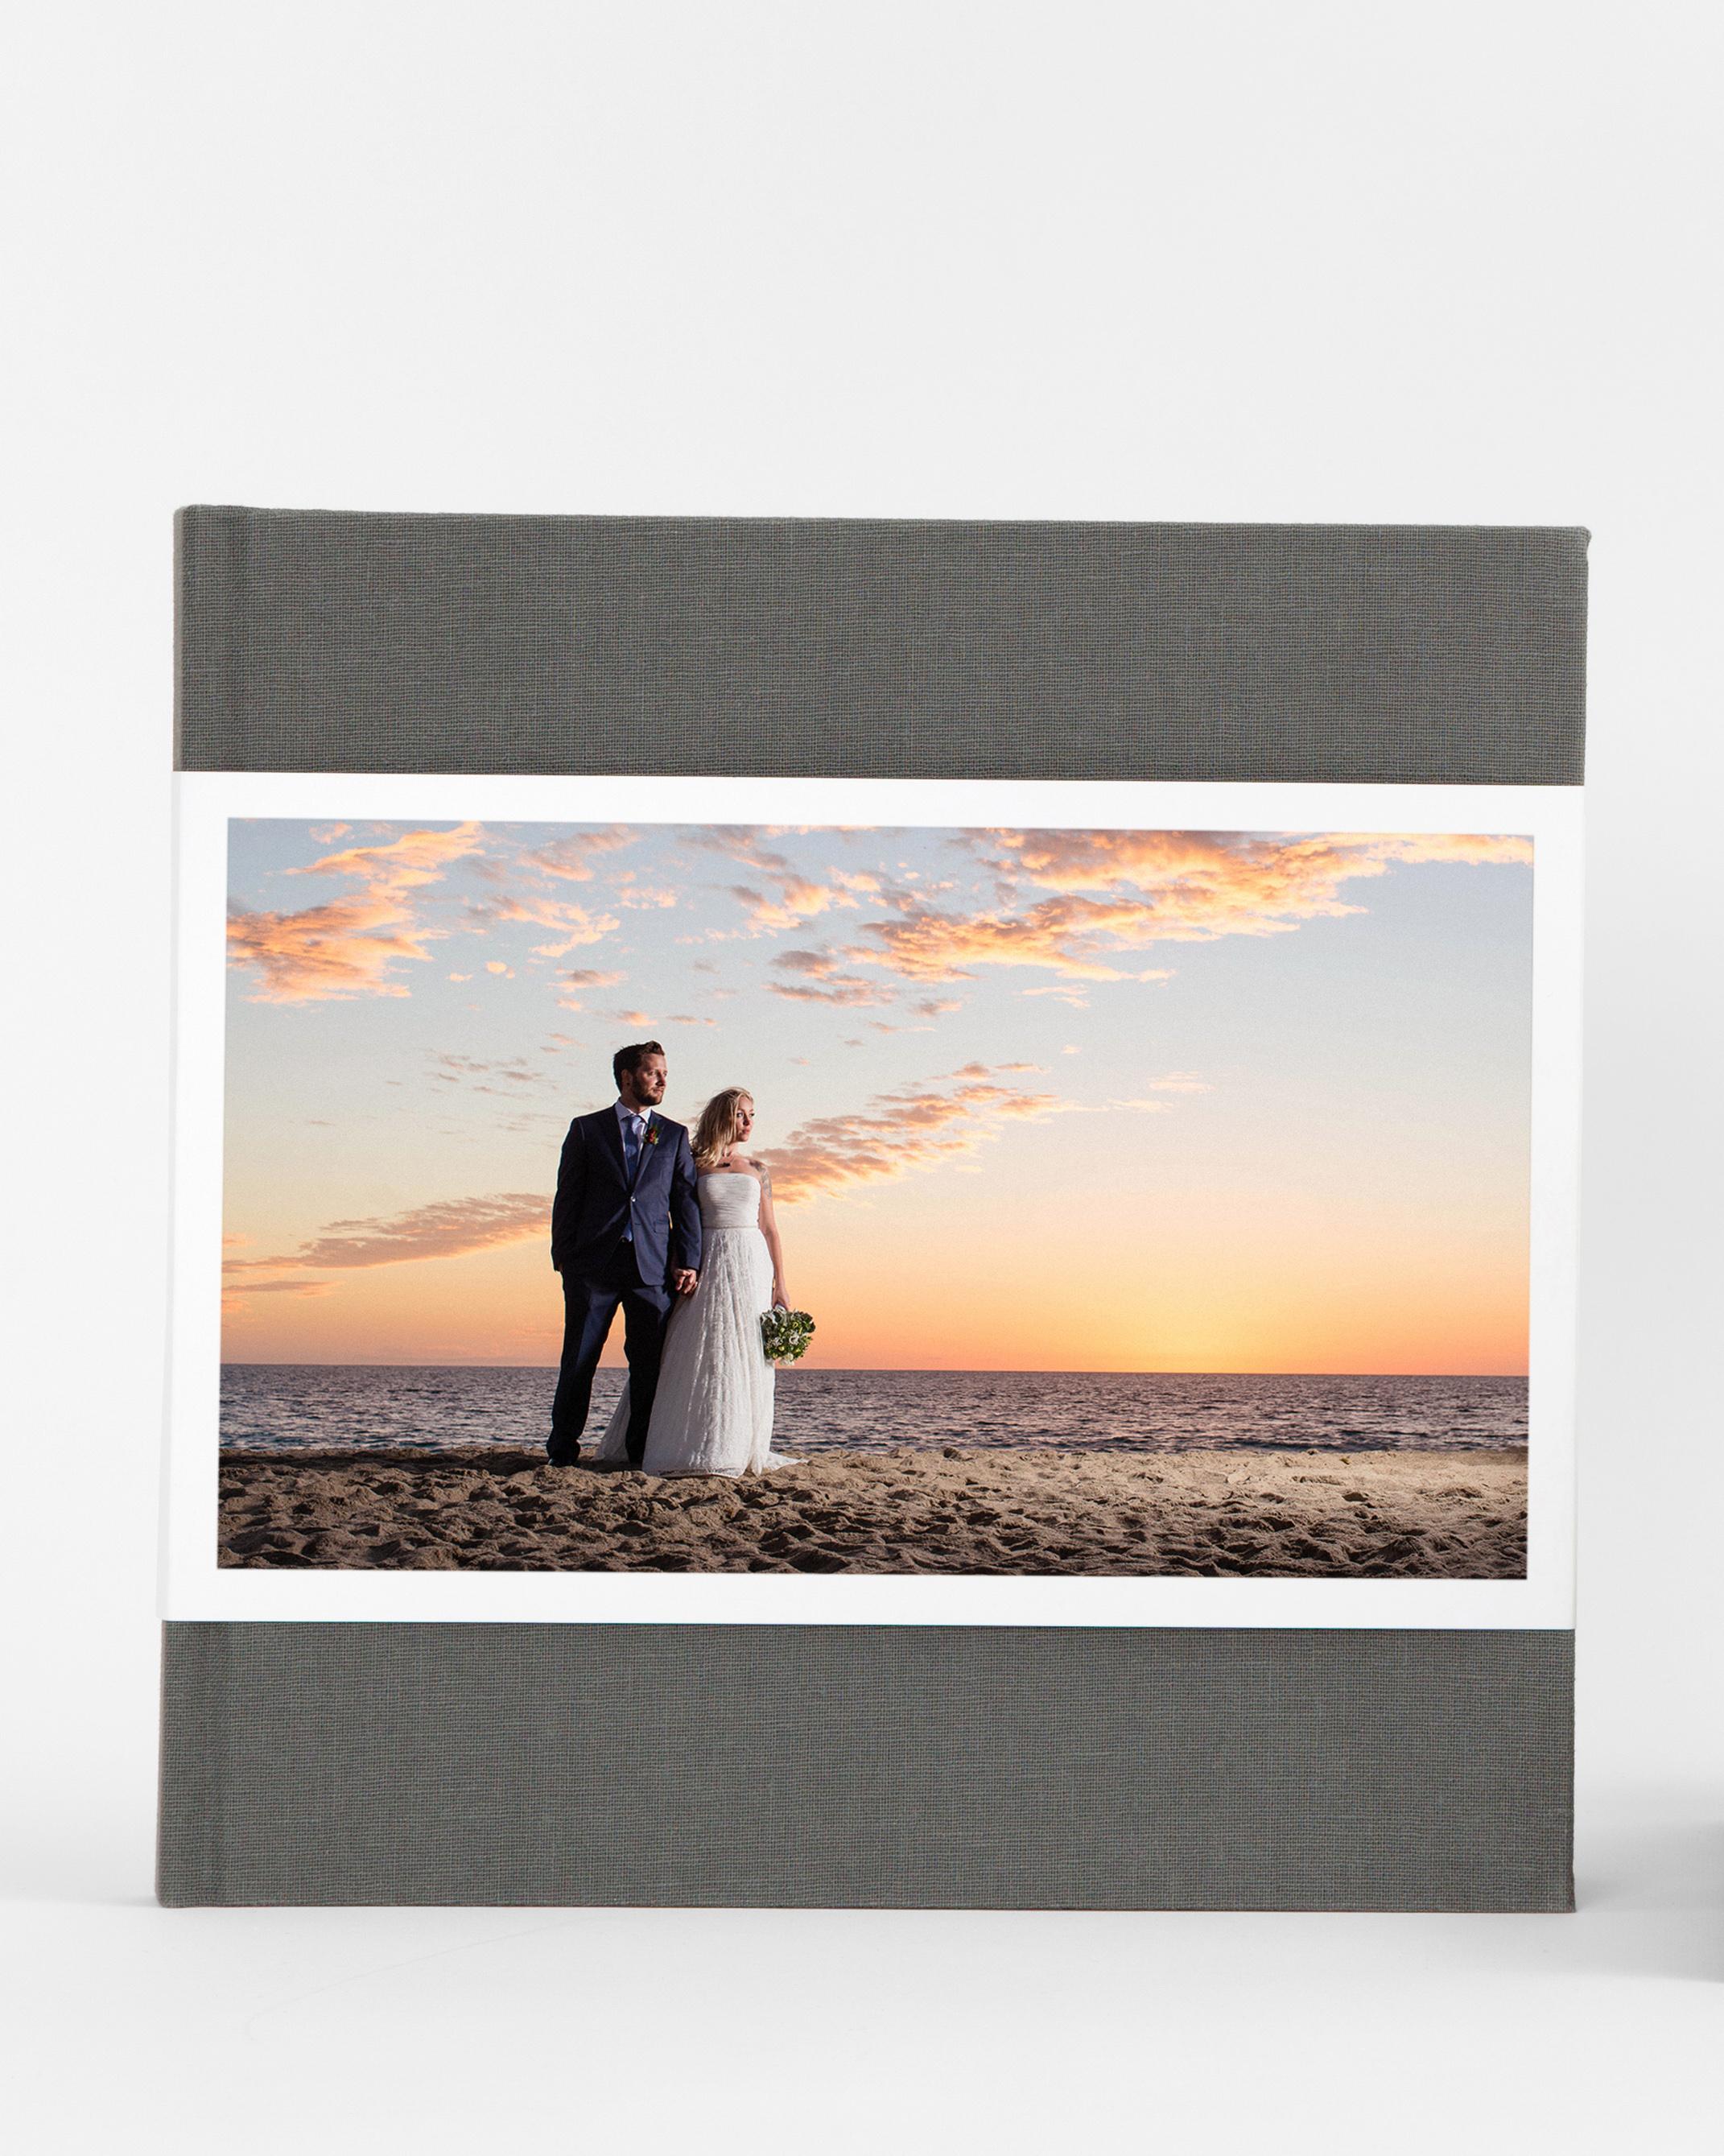 wedding photo album coffee table book with dust jacket